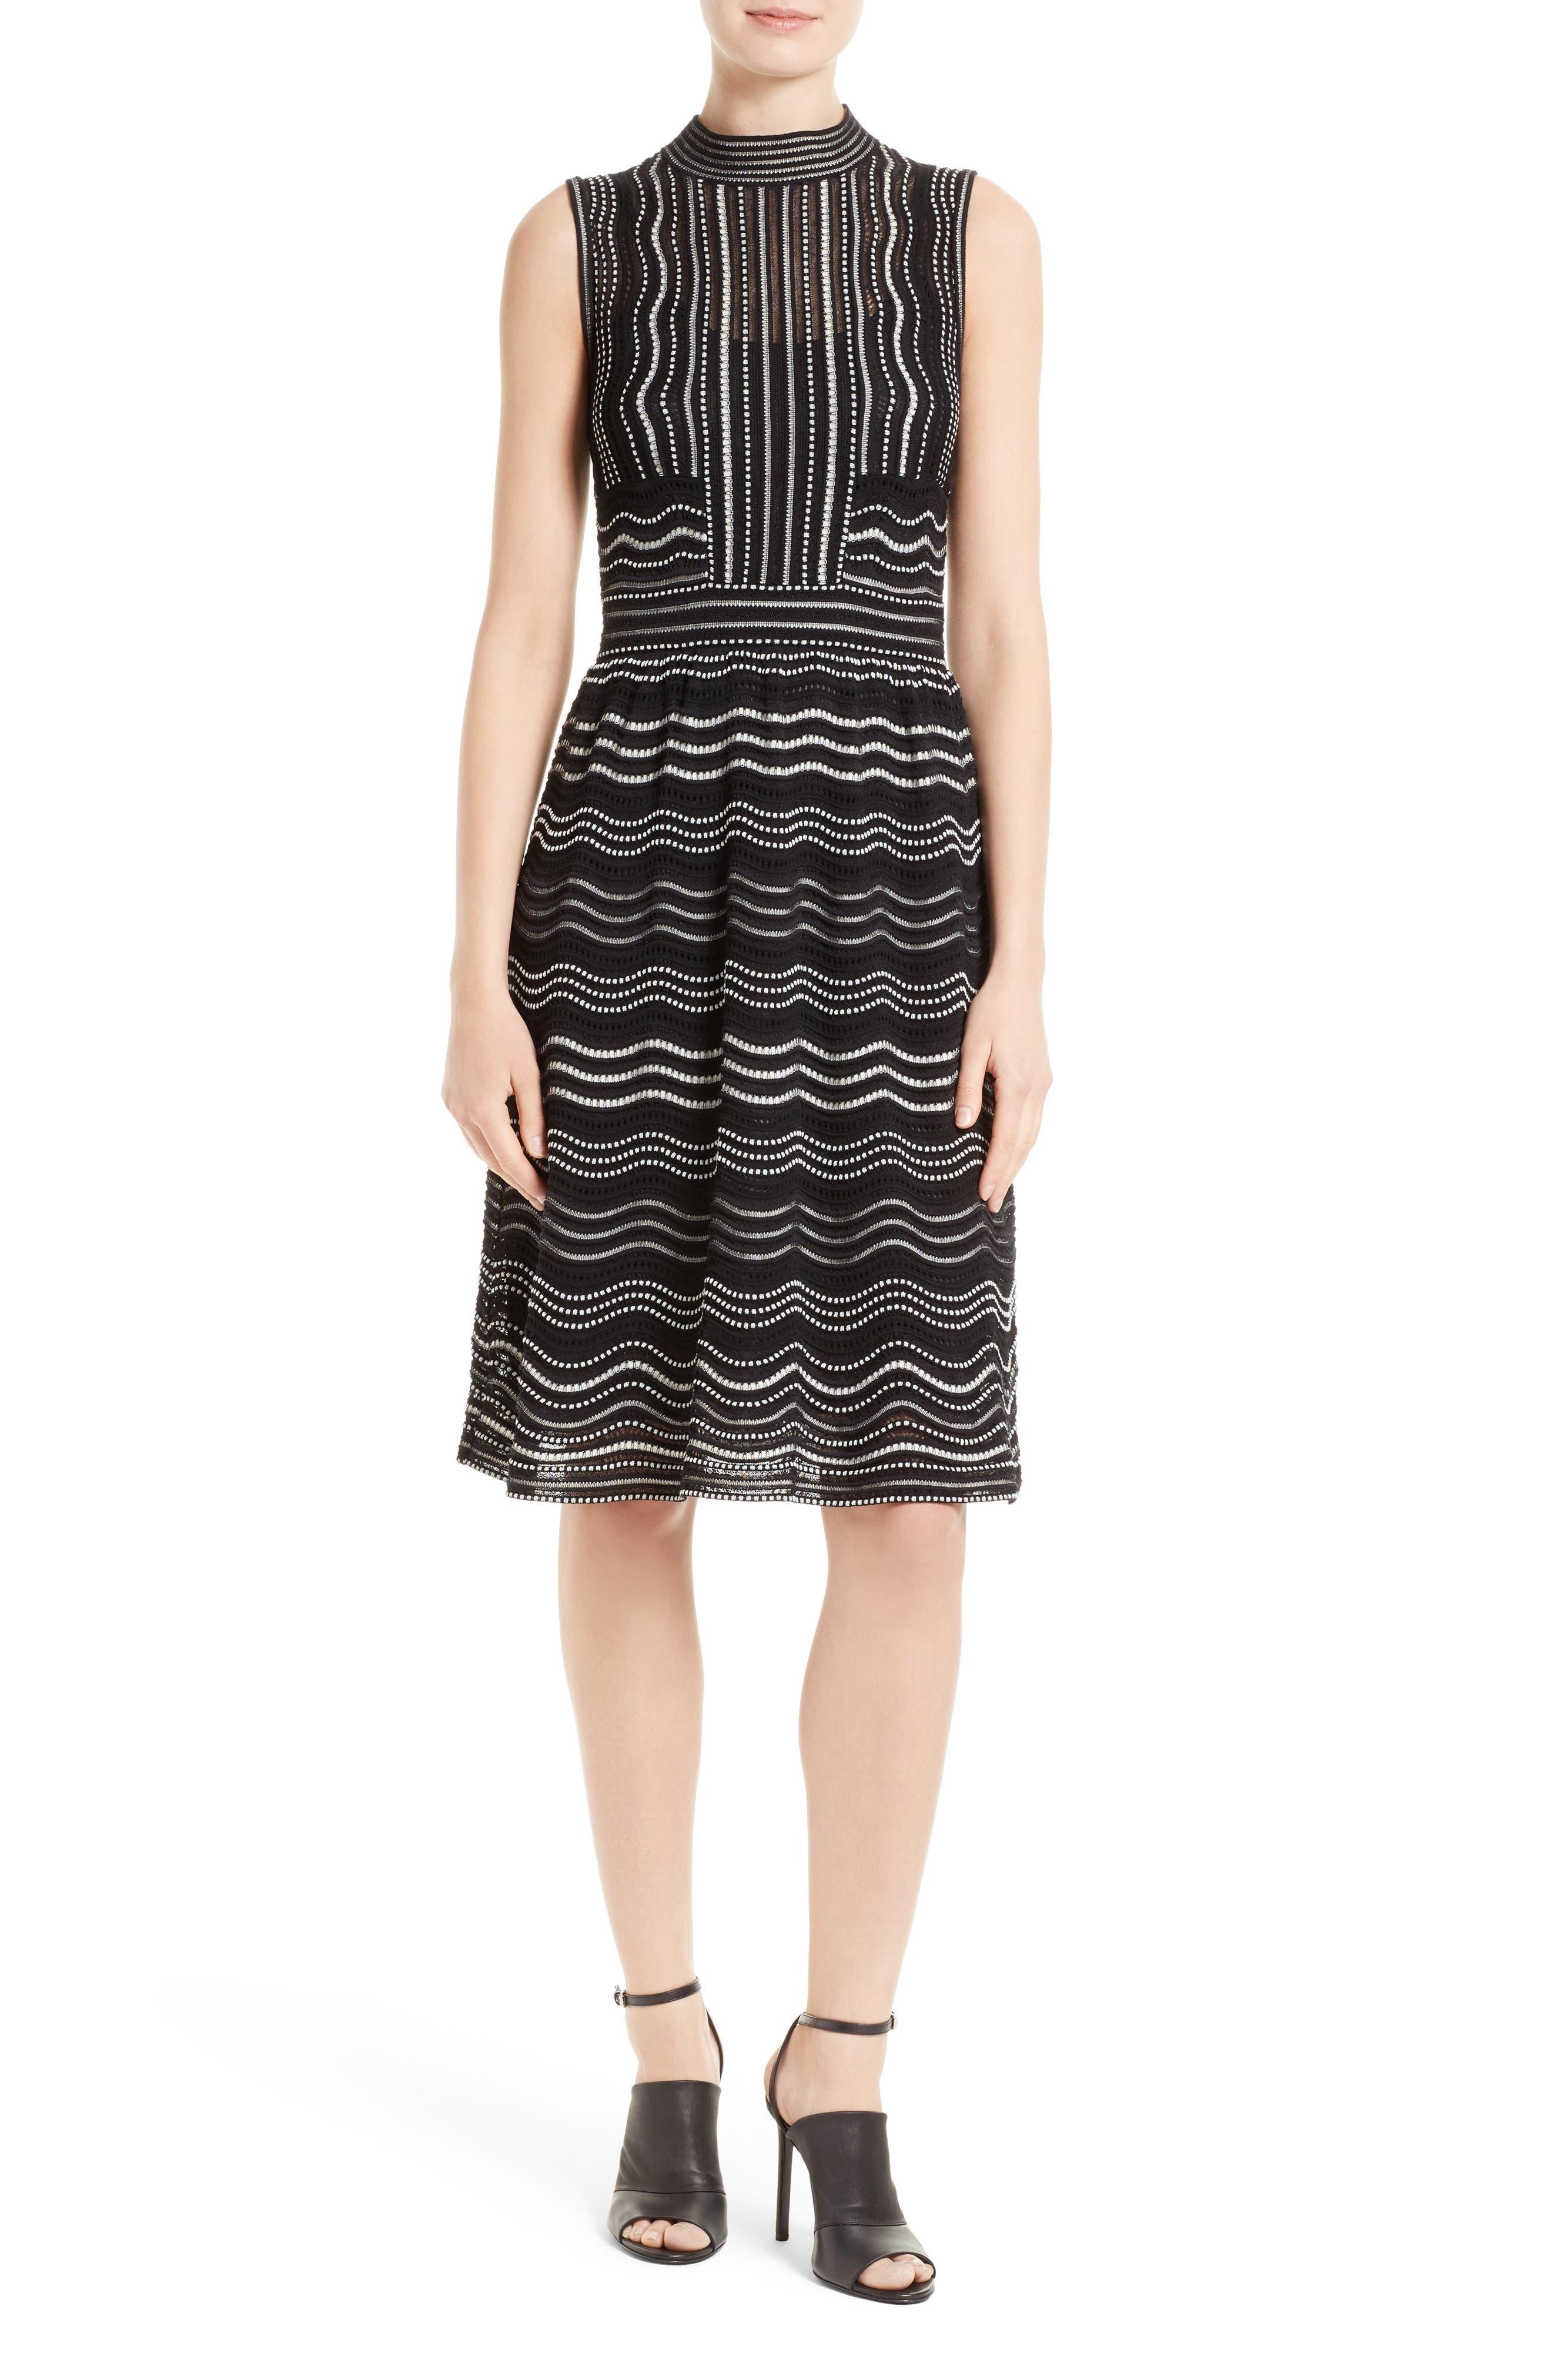 Alternate Image 1 Selected - M Missoni Ripple Dot Fit & Flare Dress